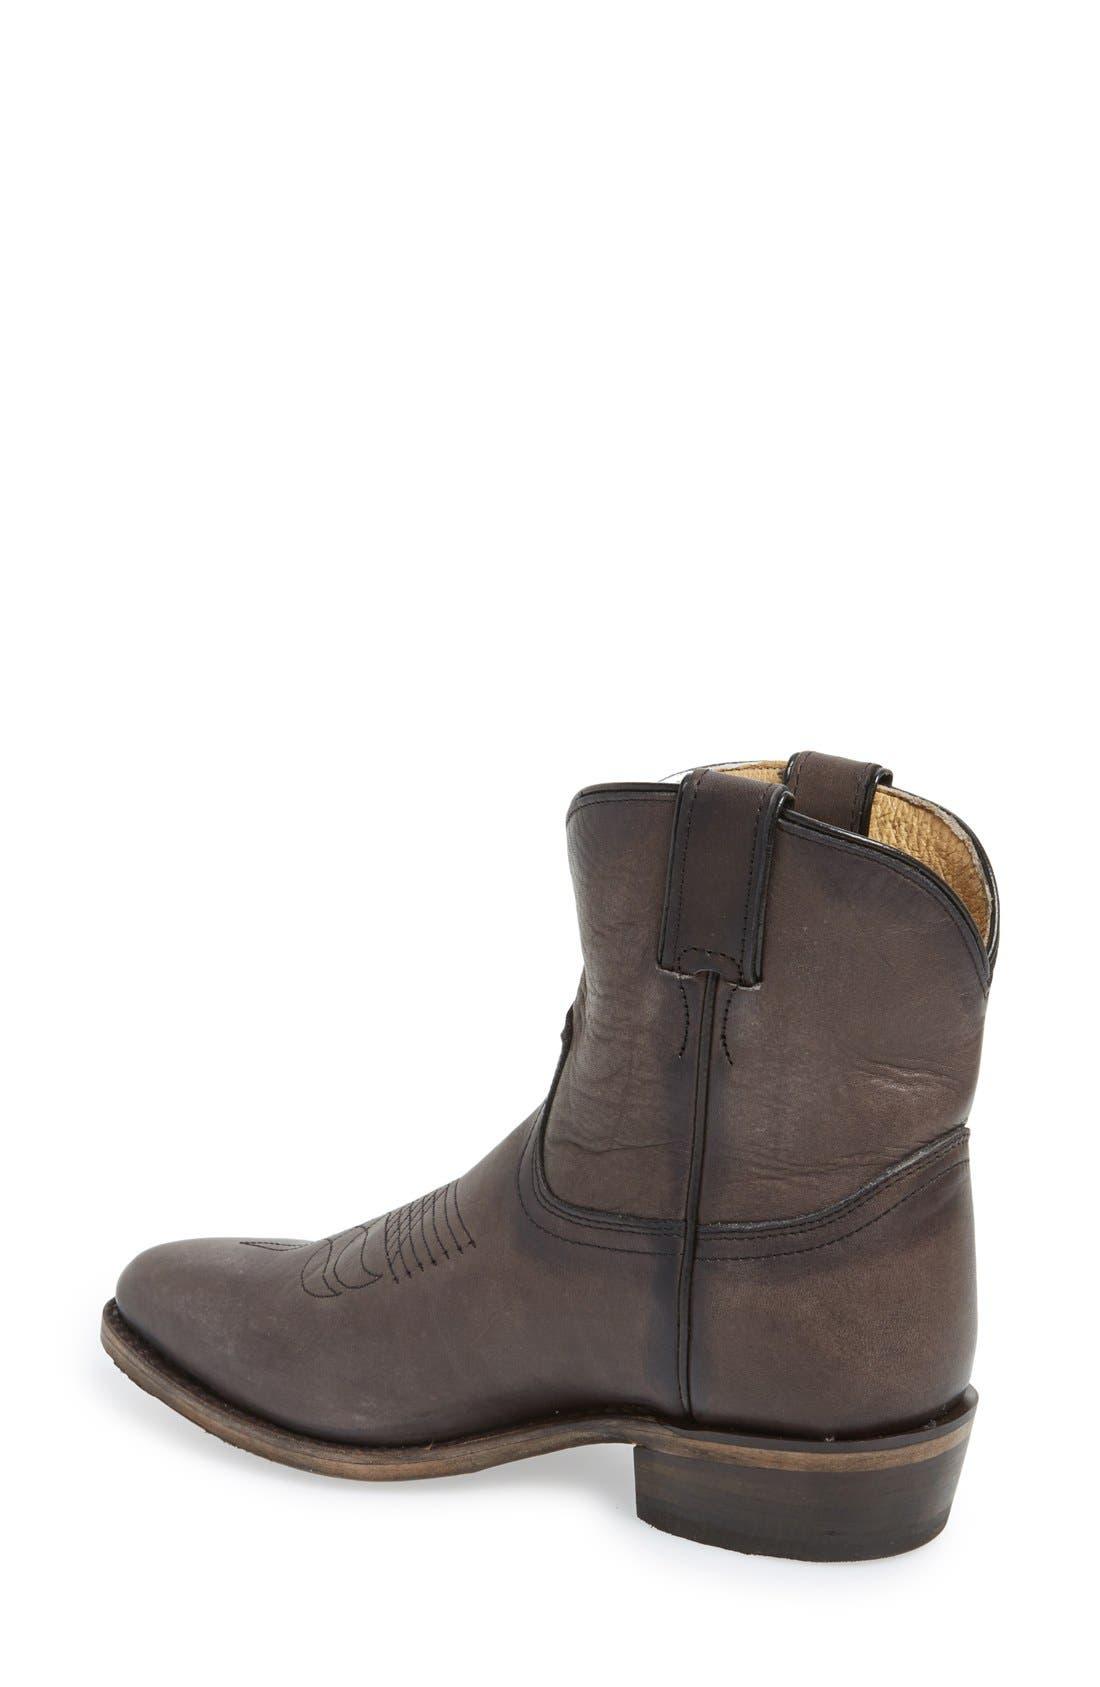 Alternate Image 2  - Frye 'BillyShort' Pointy Toe Boot (Women)